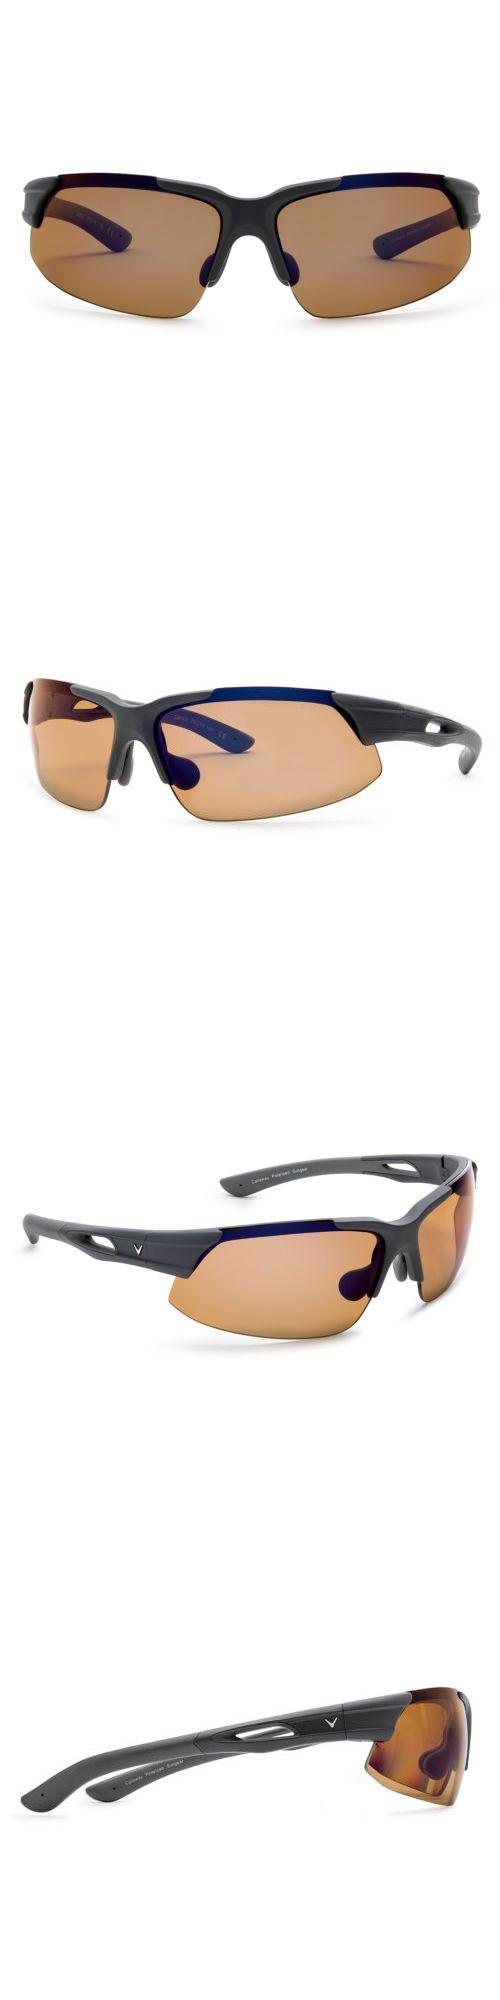 14a4d086a57f Sport Protective Eyewear 158938: Callaway Peregrine Golf Sunglasses (Matte  Black Brown Polarized) -